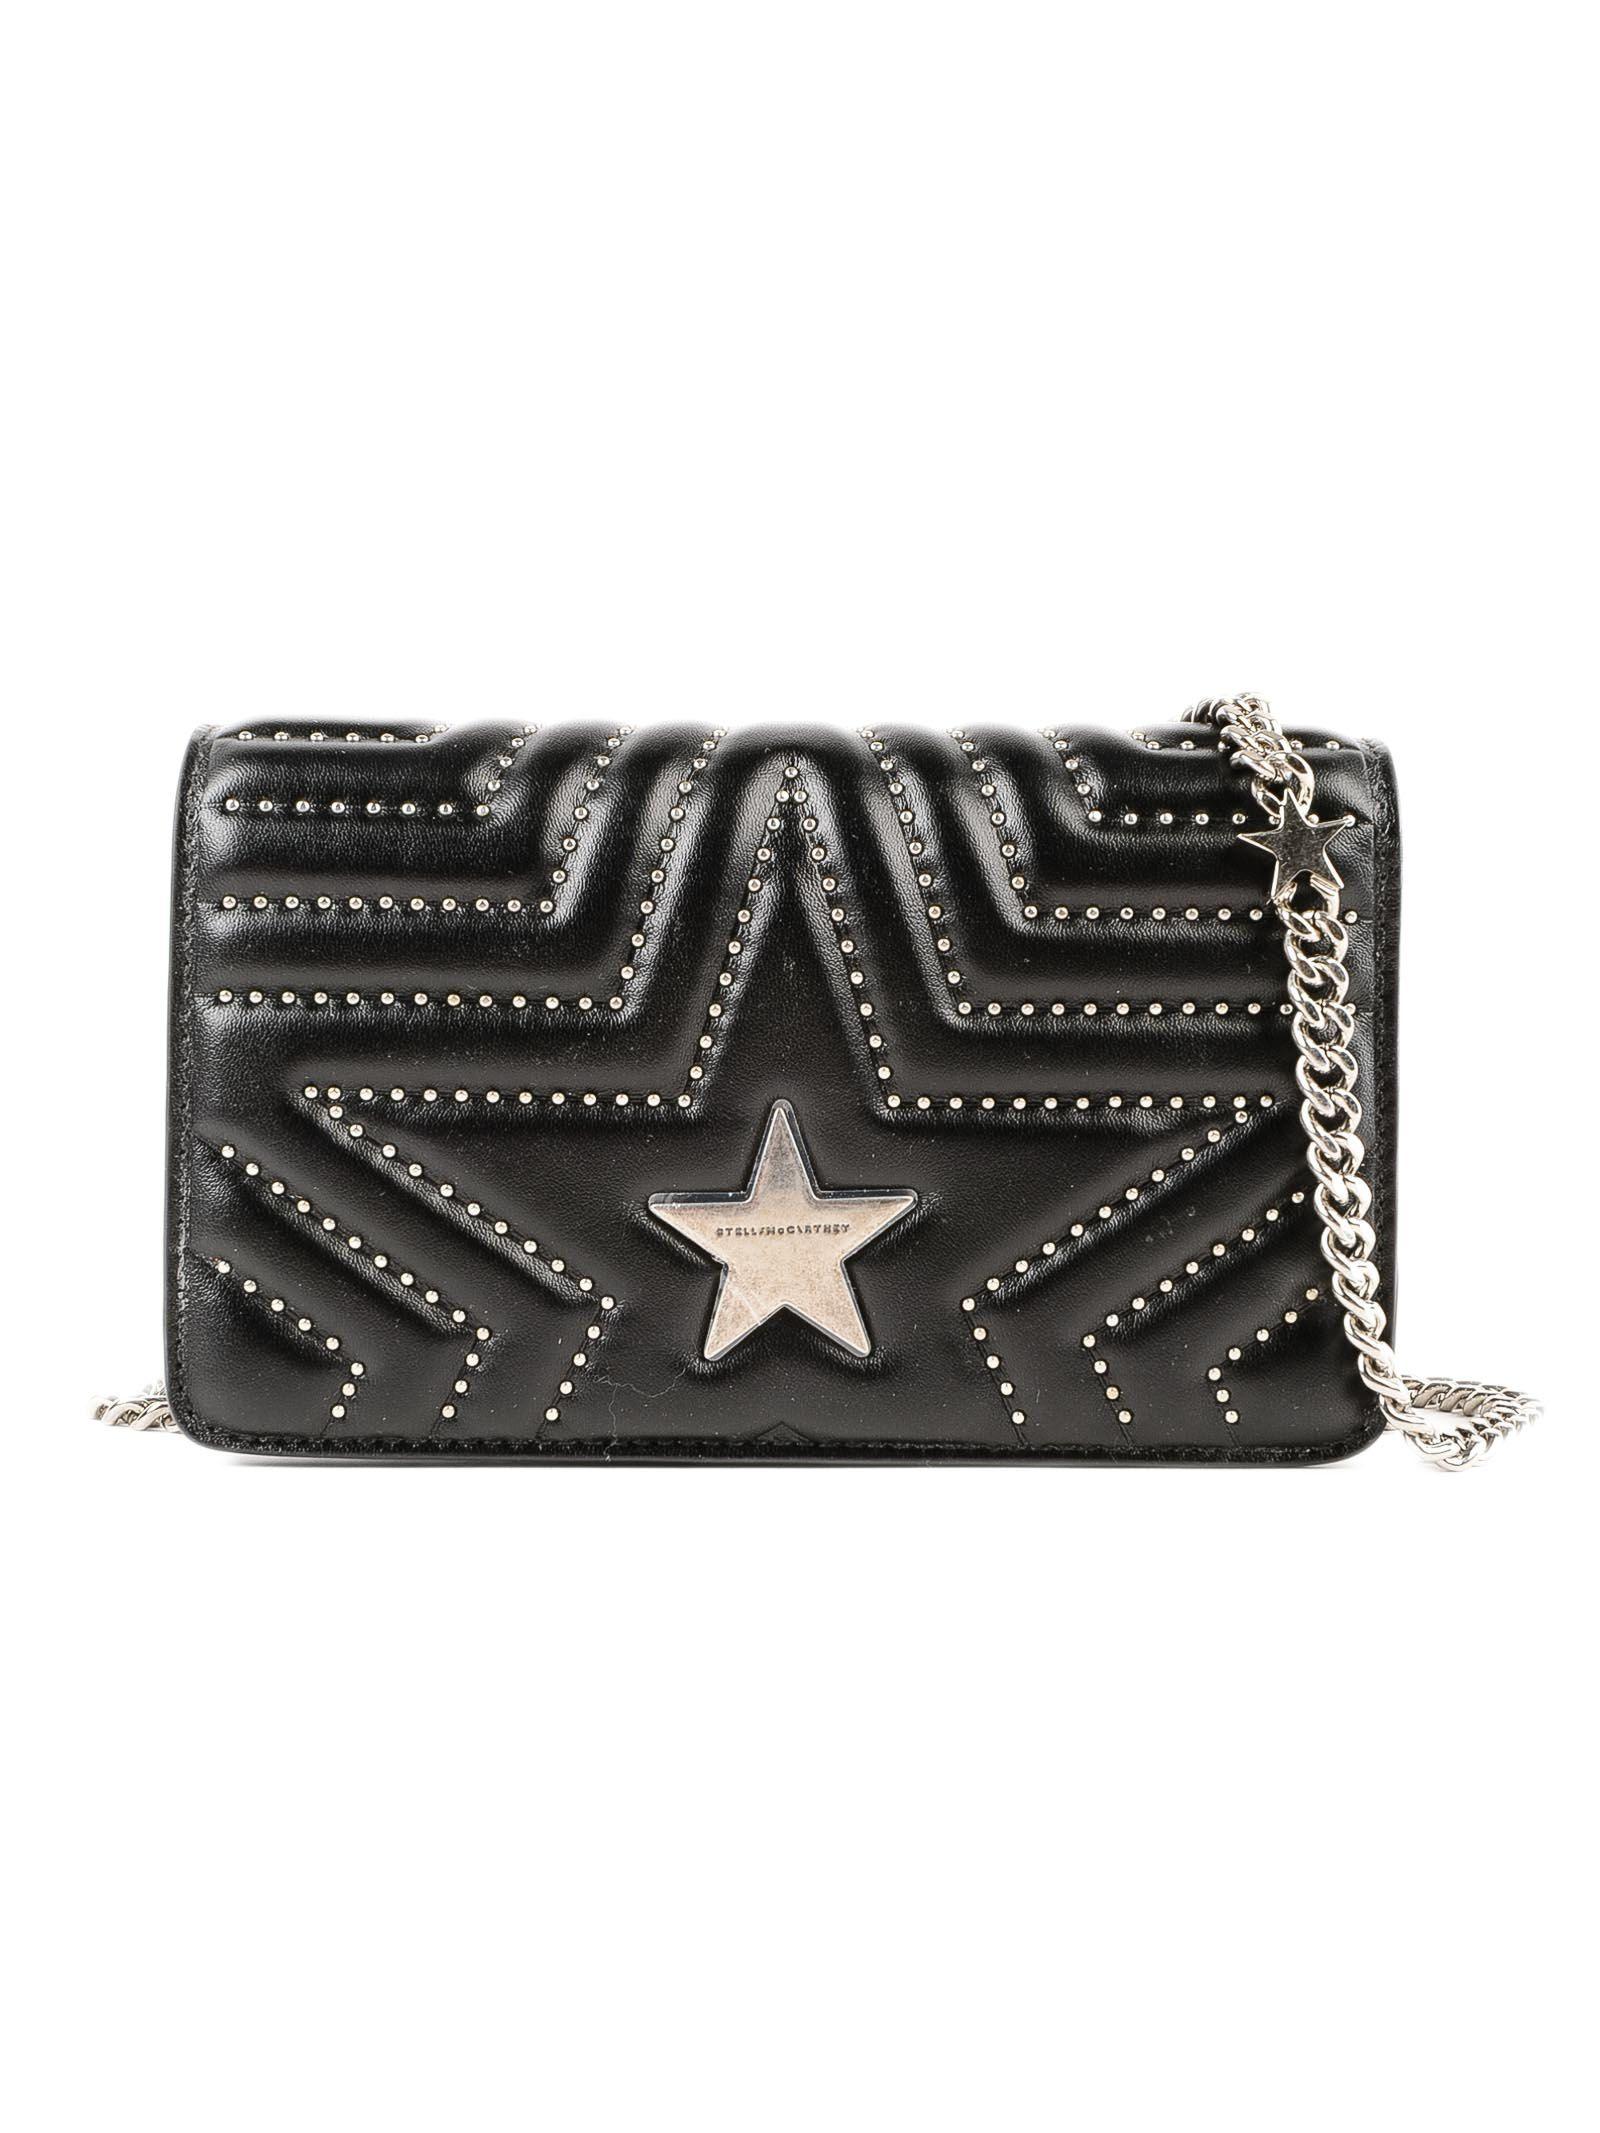 2b9cfc773e86 Stella Mccartney Star Quilted Shoulder Bag In Black